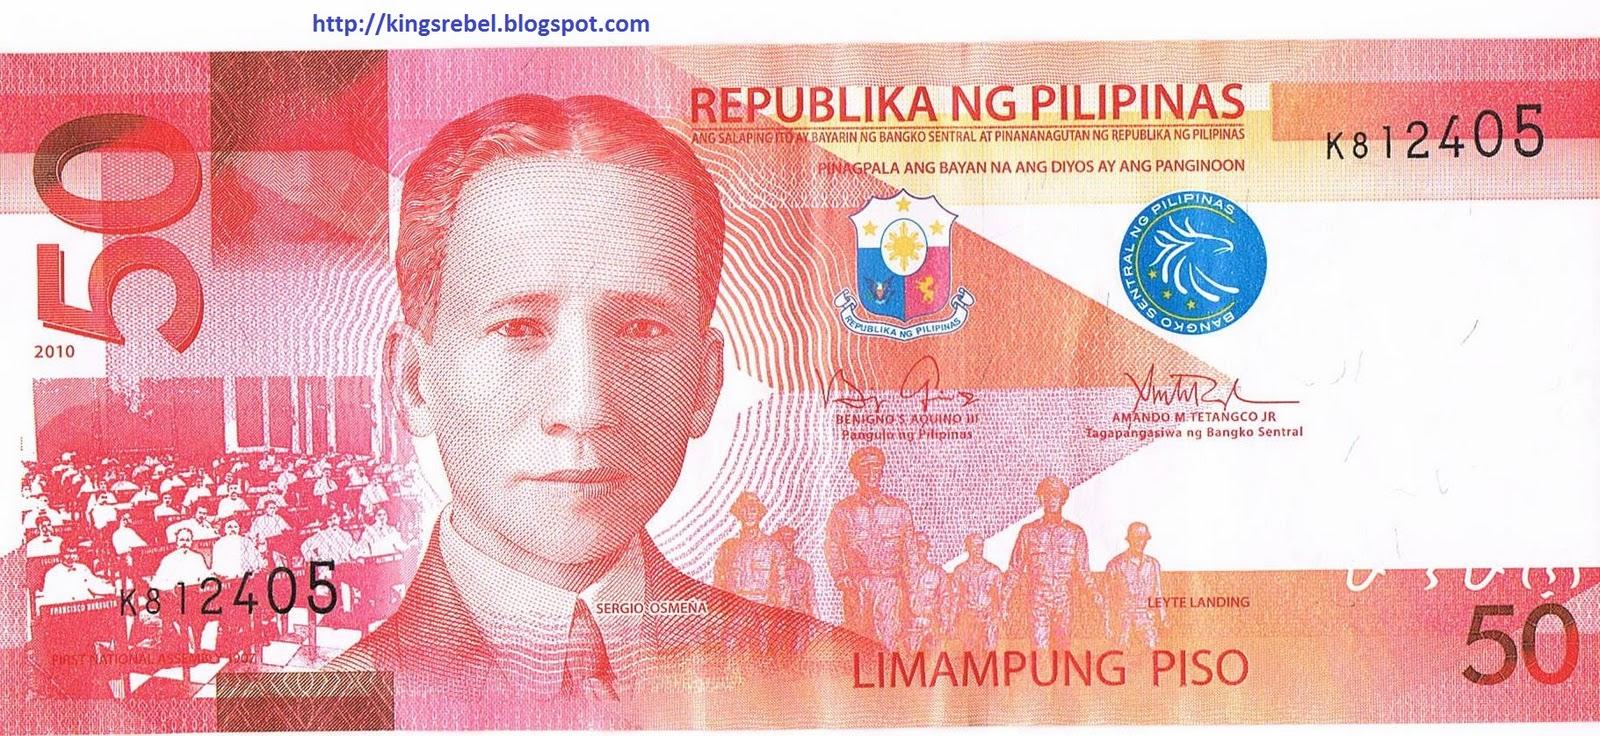 19yo filipina earning pesos 2 3